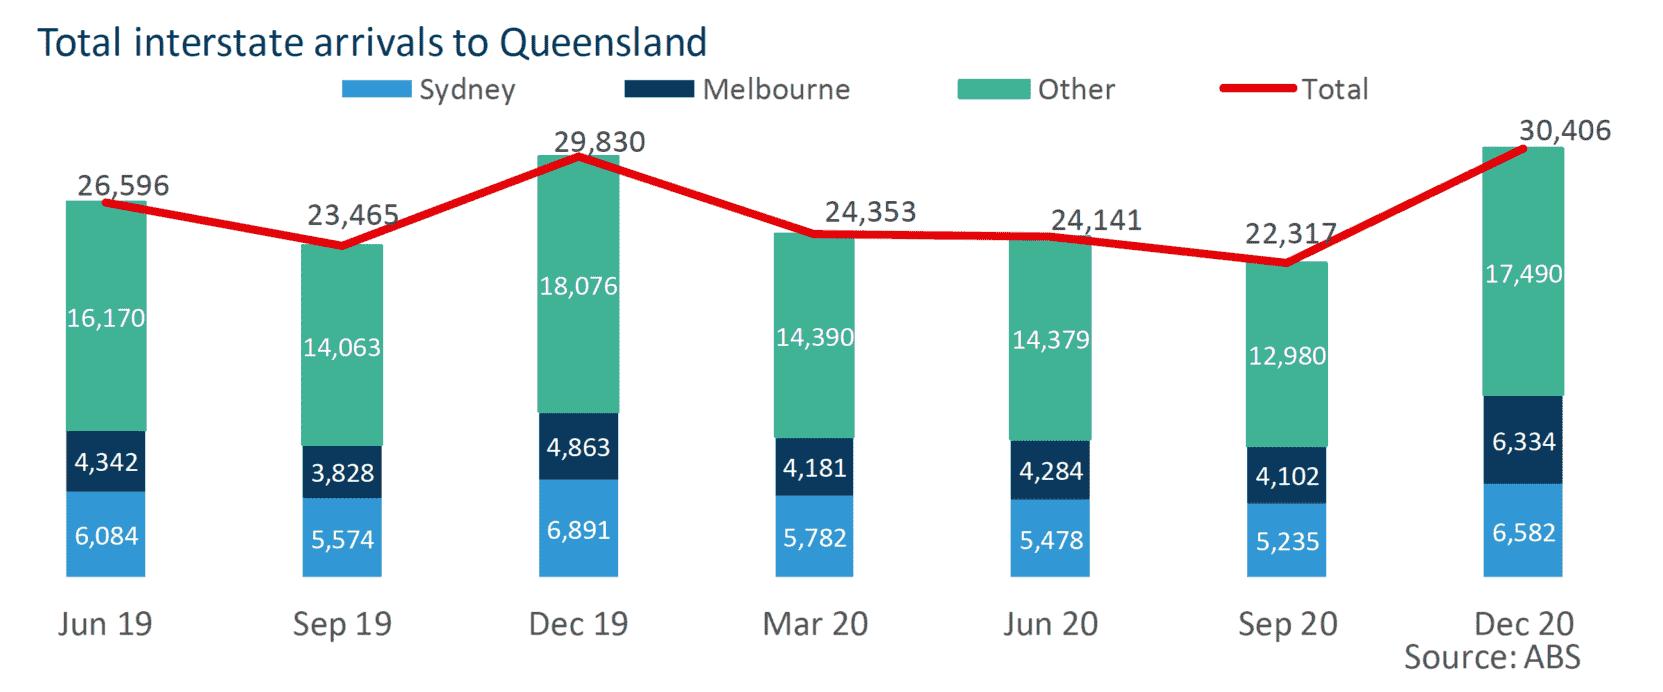 Total Interstate Arrivals To Queensland